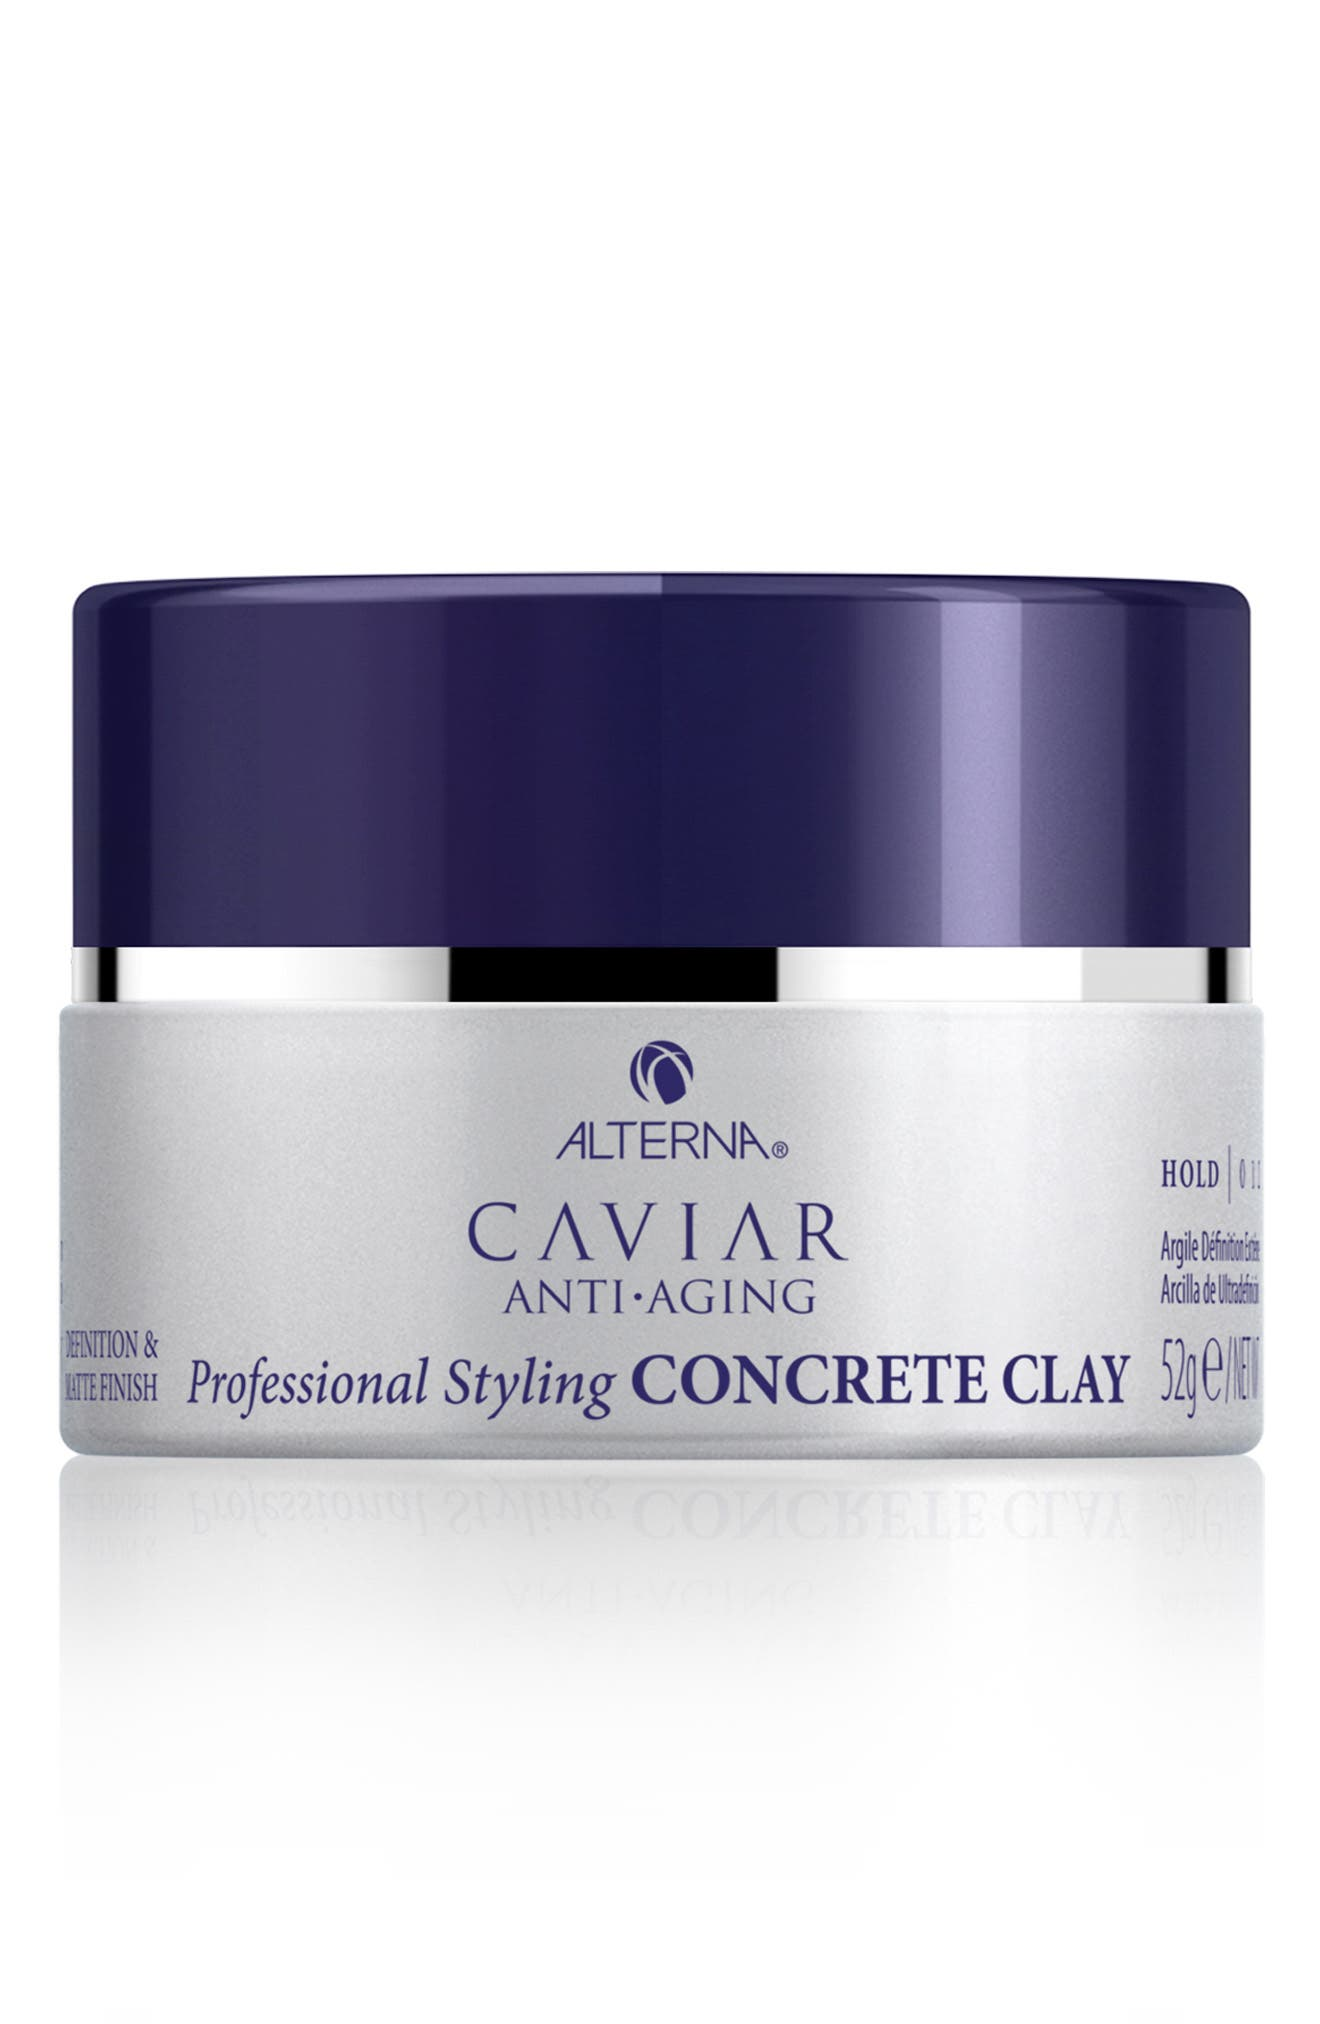 Alterna Caviar Anti-Aging Professional Styling Concrete Clay